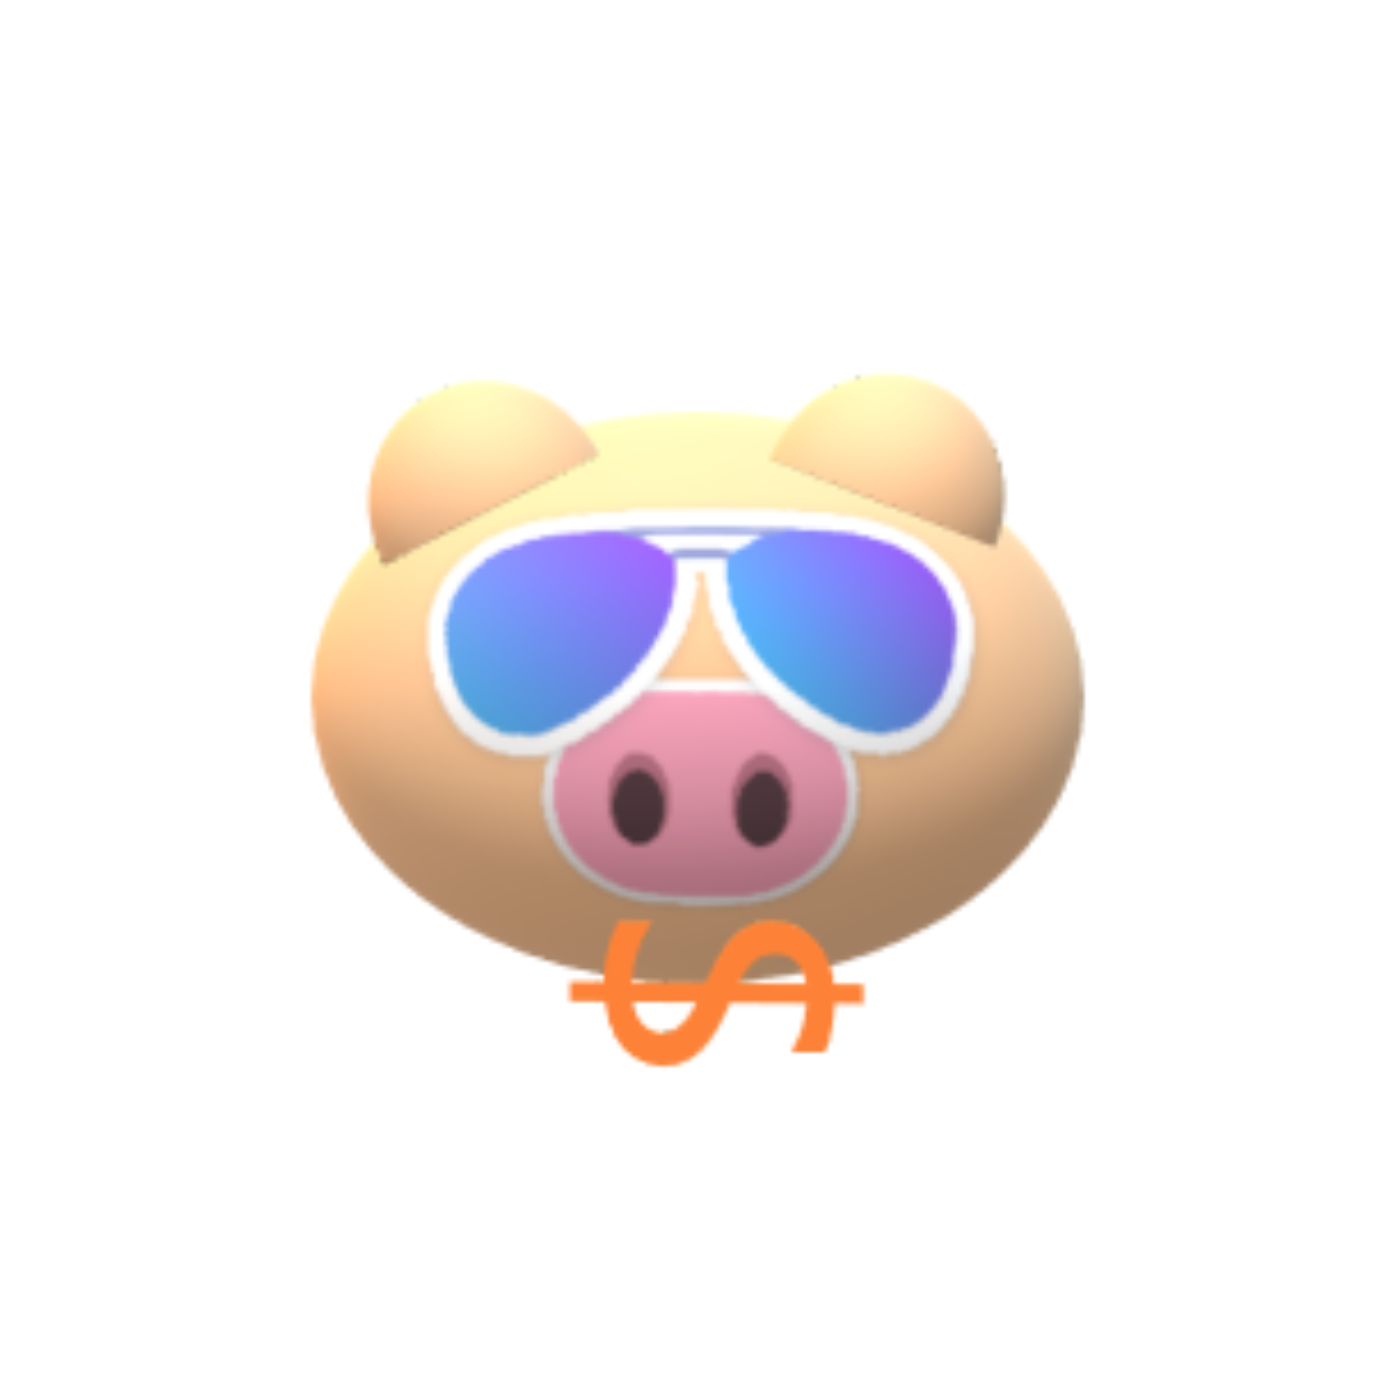 Lesson 1 - 複利 - 豬力安和孩子談錢